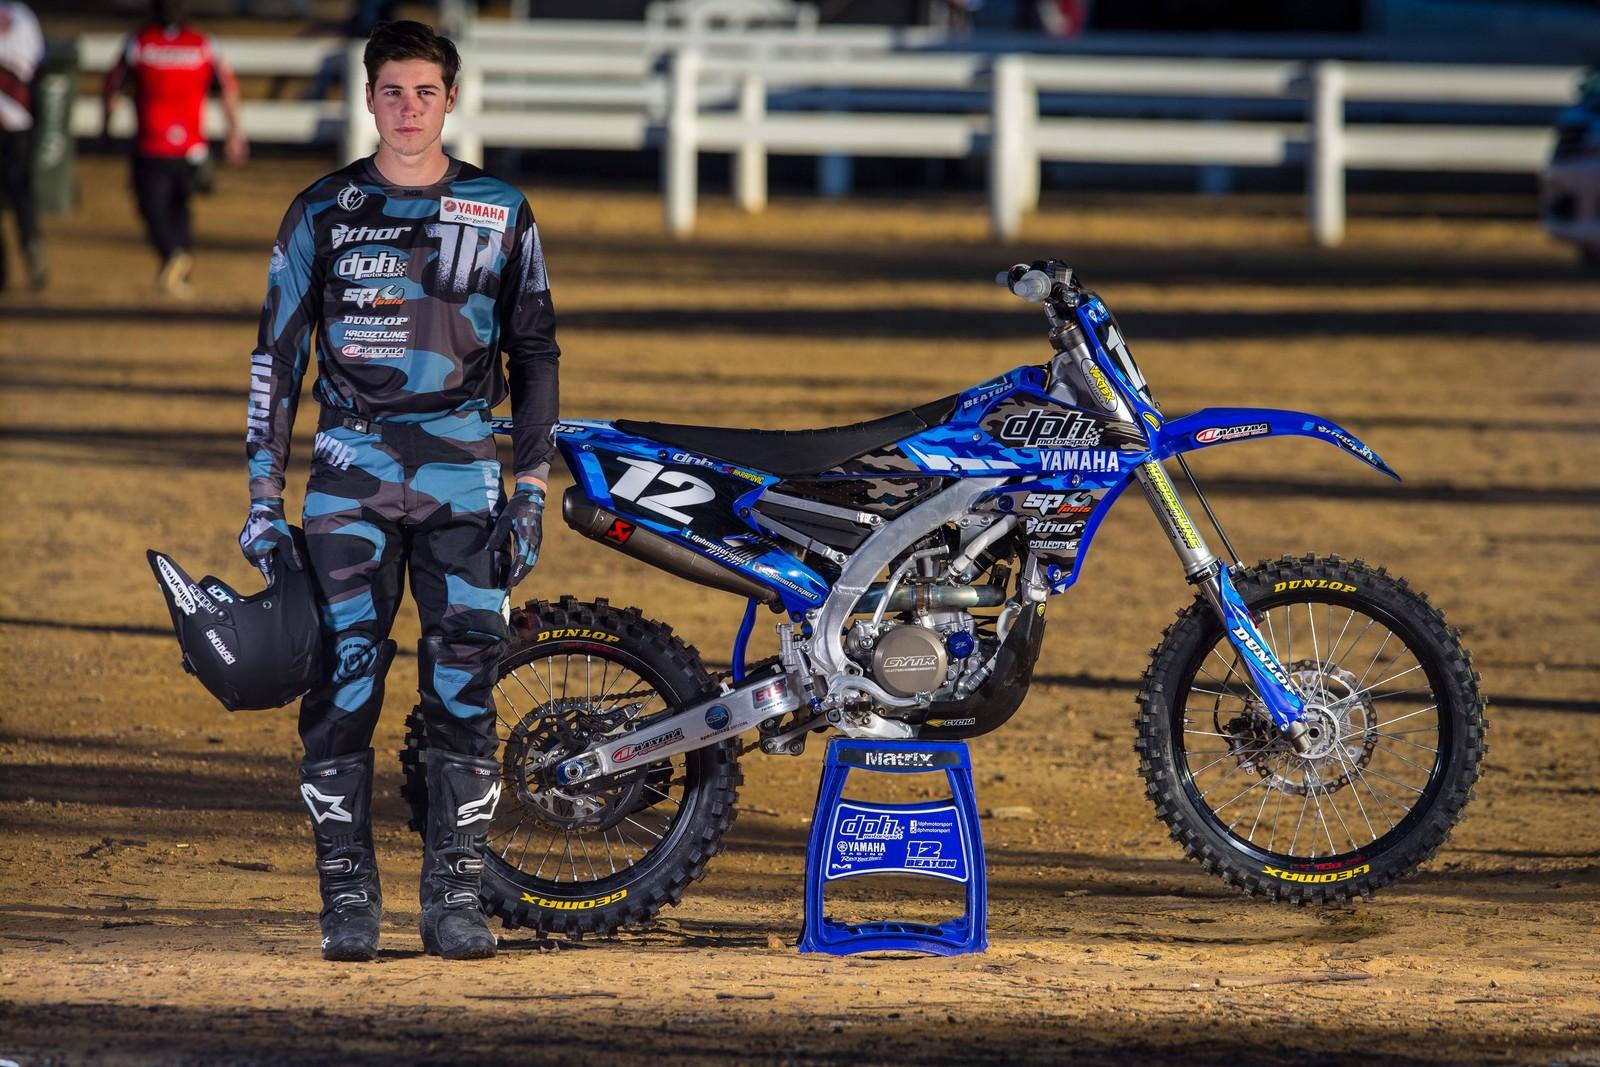 Jed Beaton - Australian Motul MX Championships: Round 6, Nowra - Motocross Pictures - Vital MX